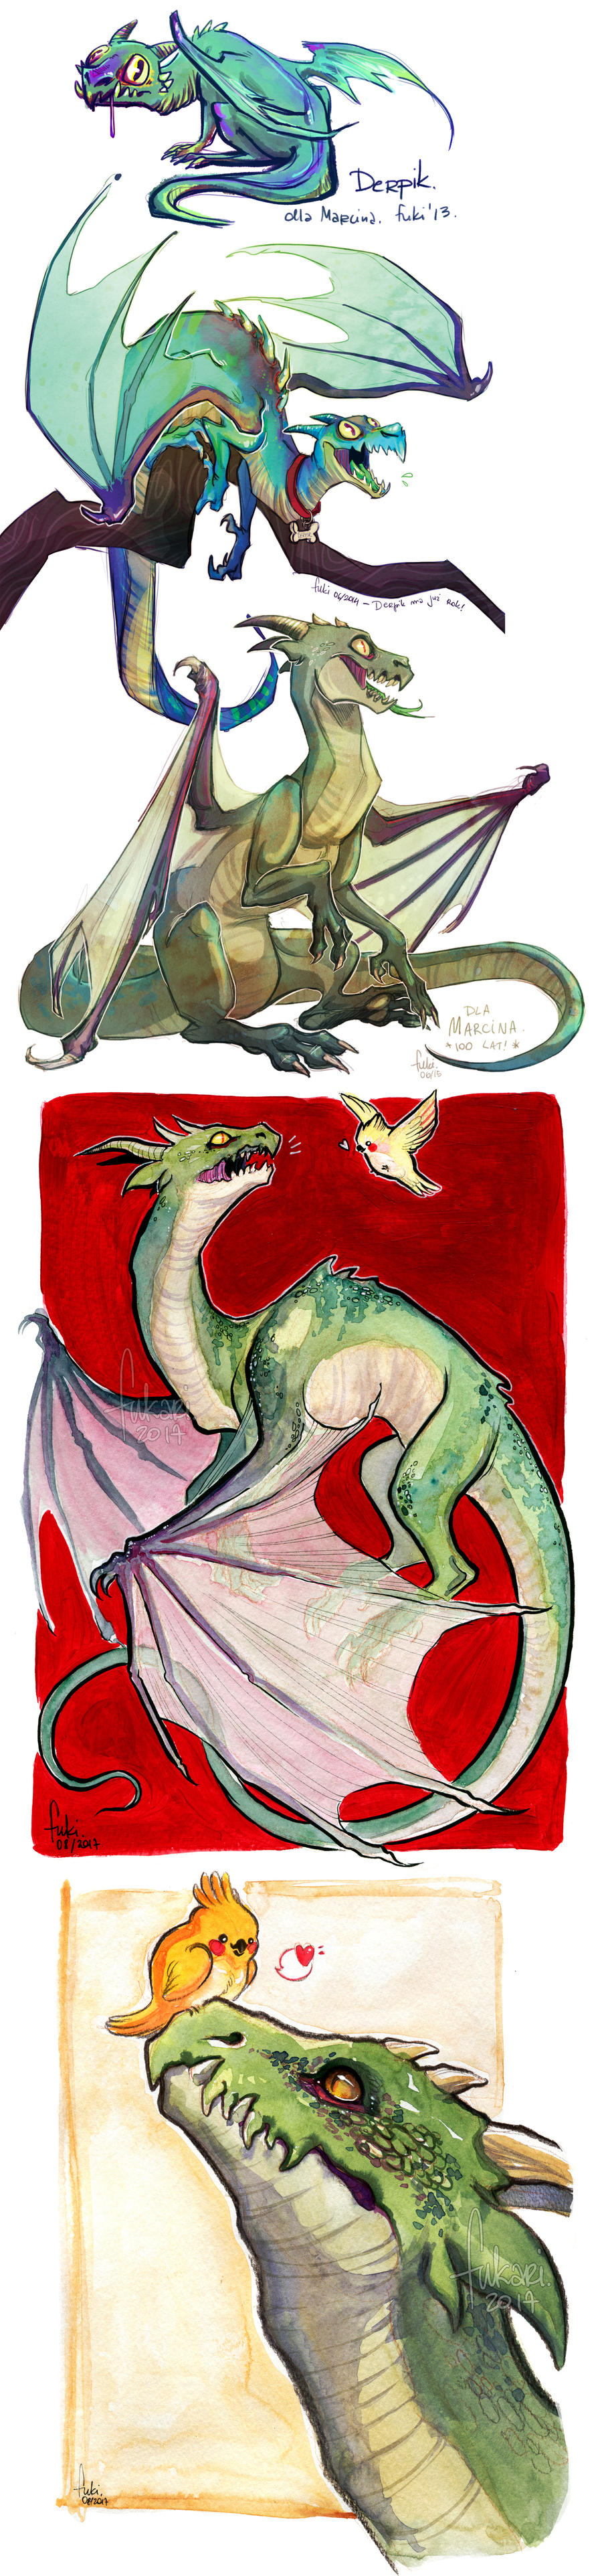 Derpik the dragon